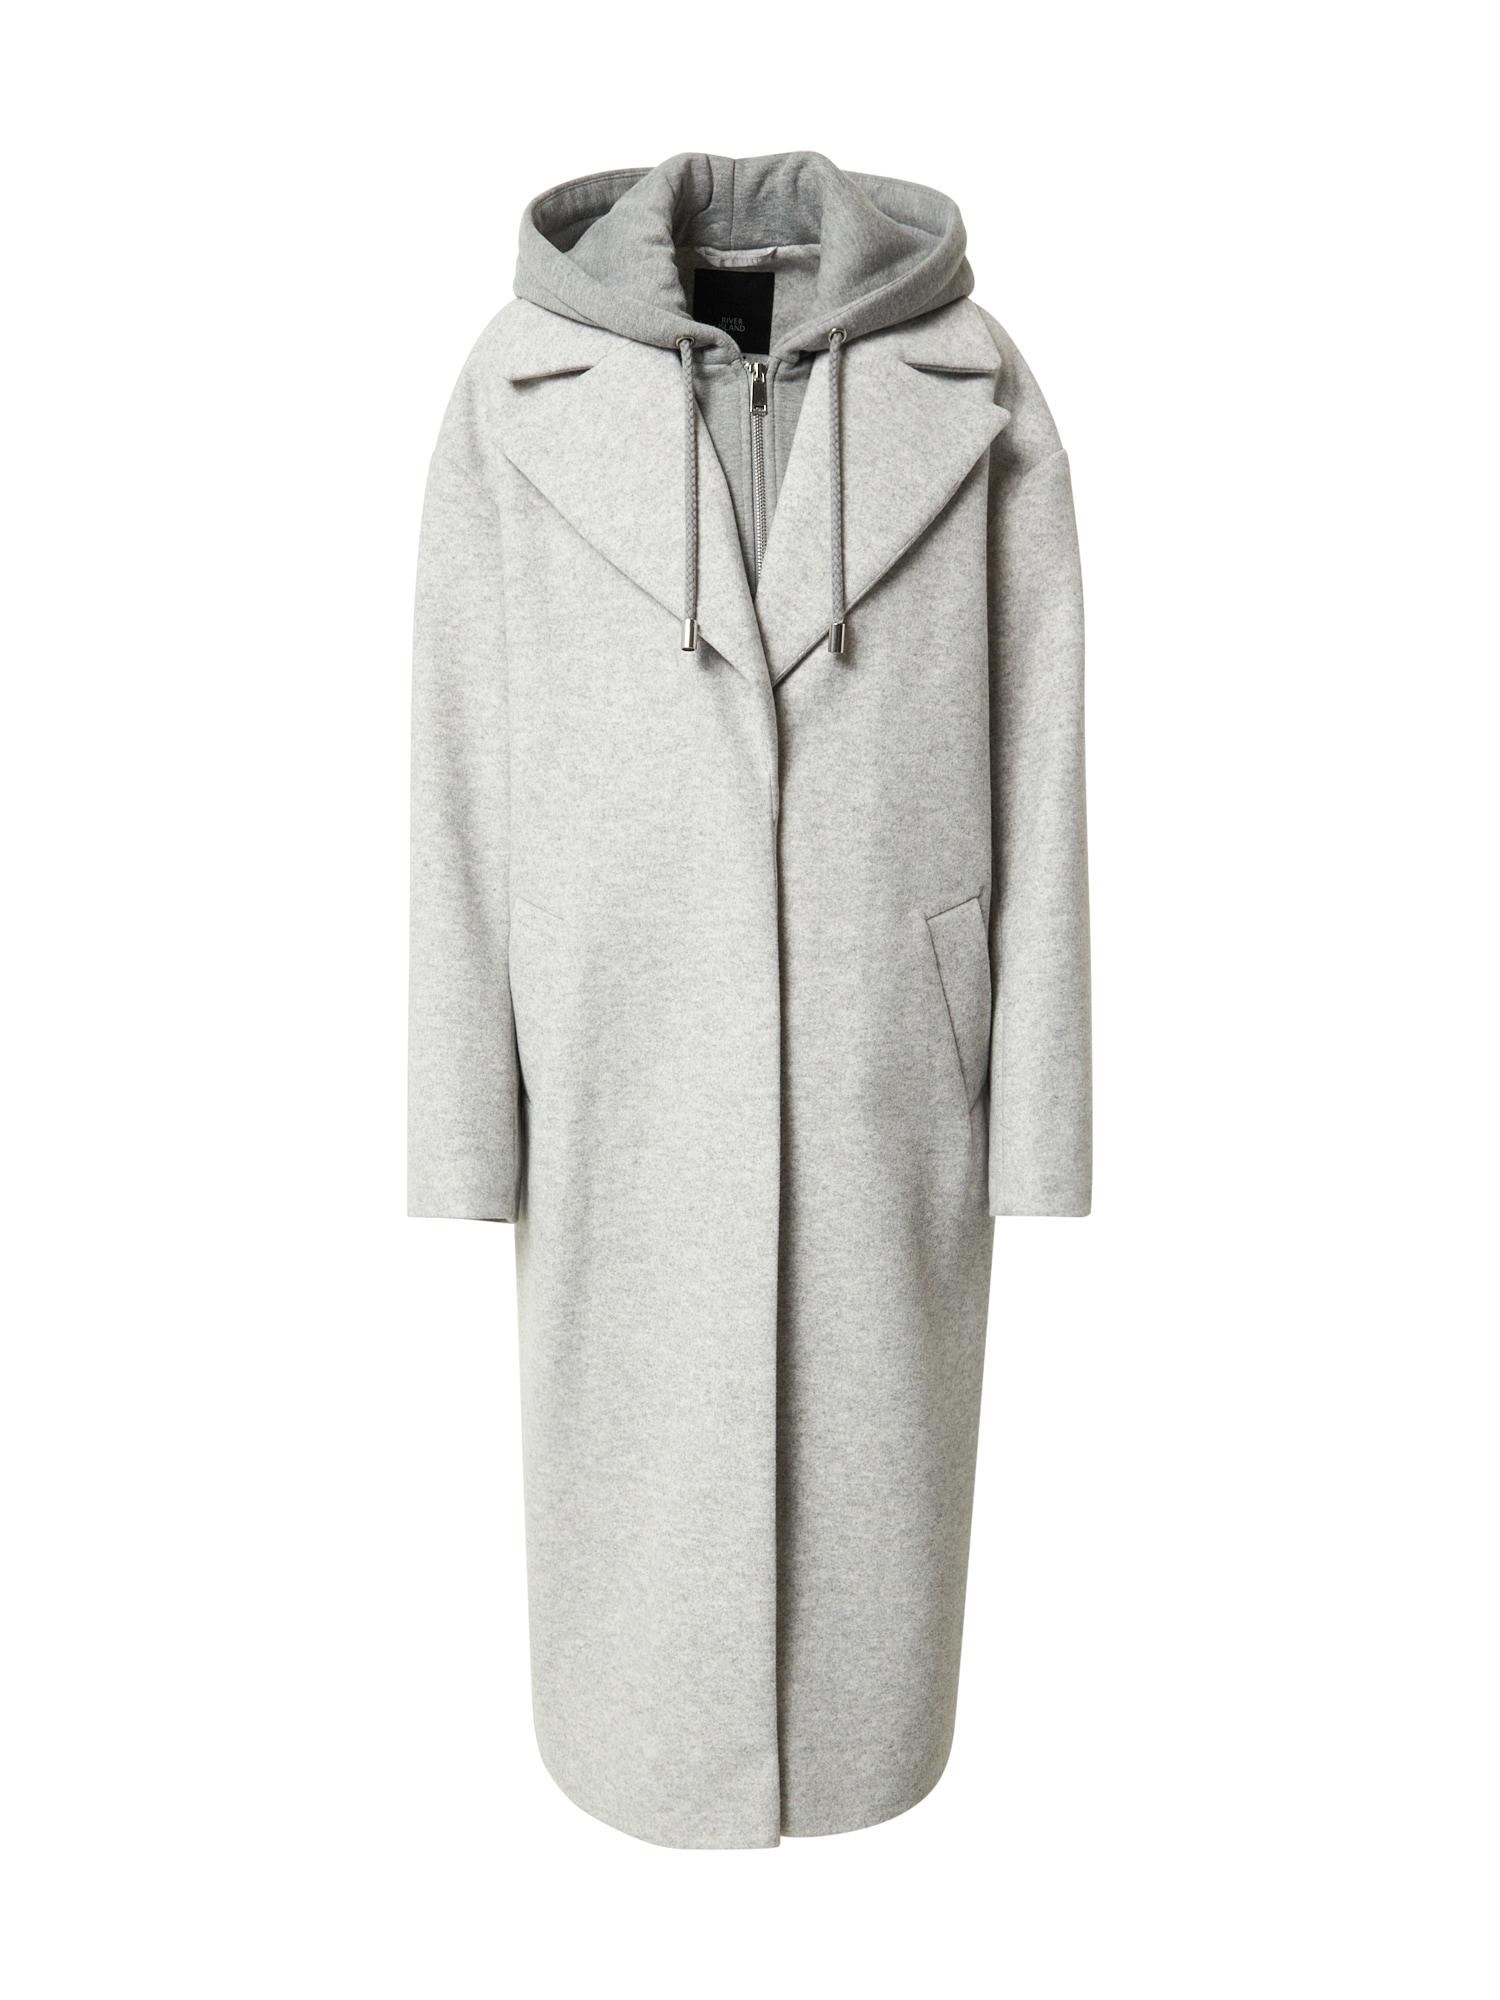 River Island Demisezoninis paltas pilka / šviesiai pilka